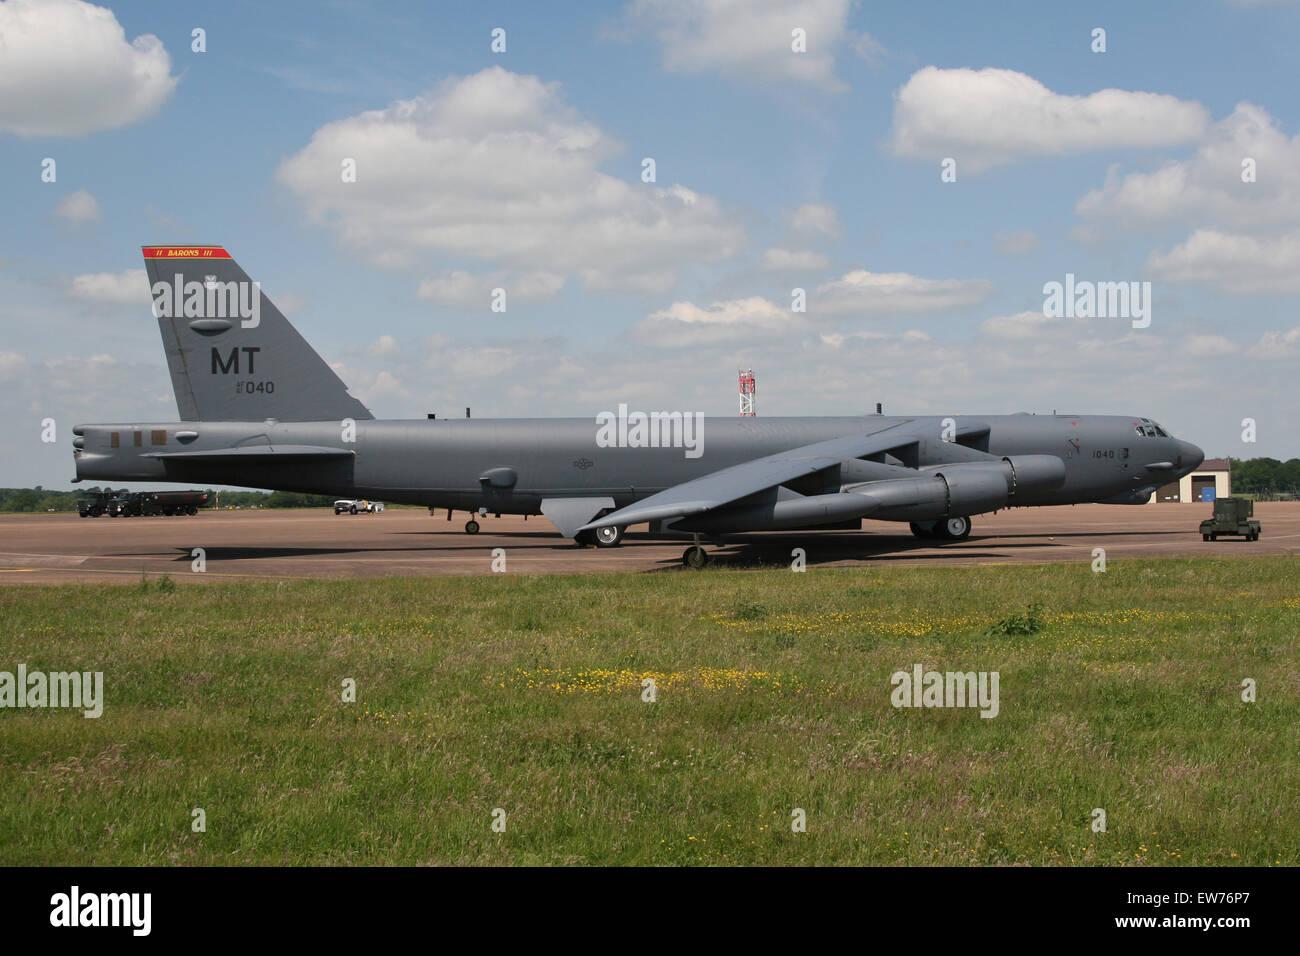 usaf b52 bomber RAF FAIRFORD - Stock Image